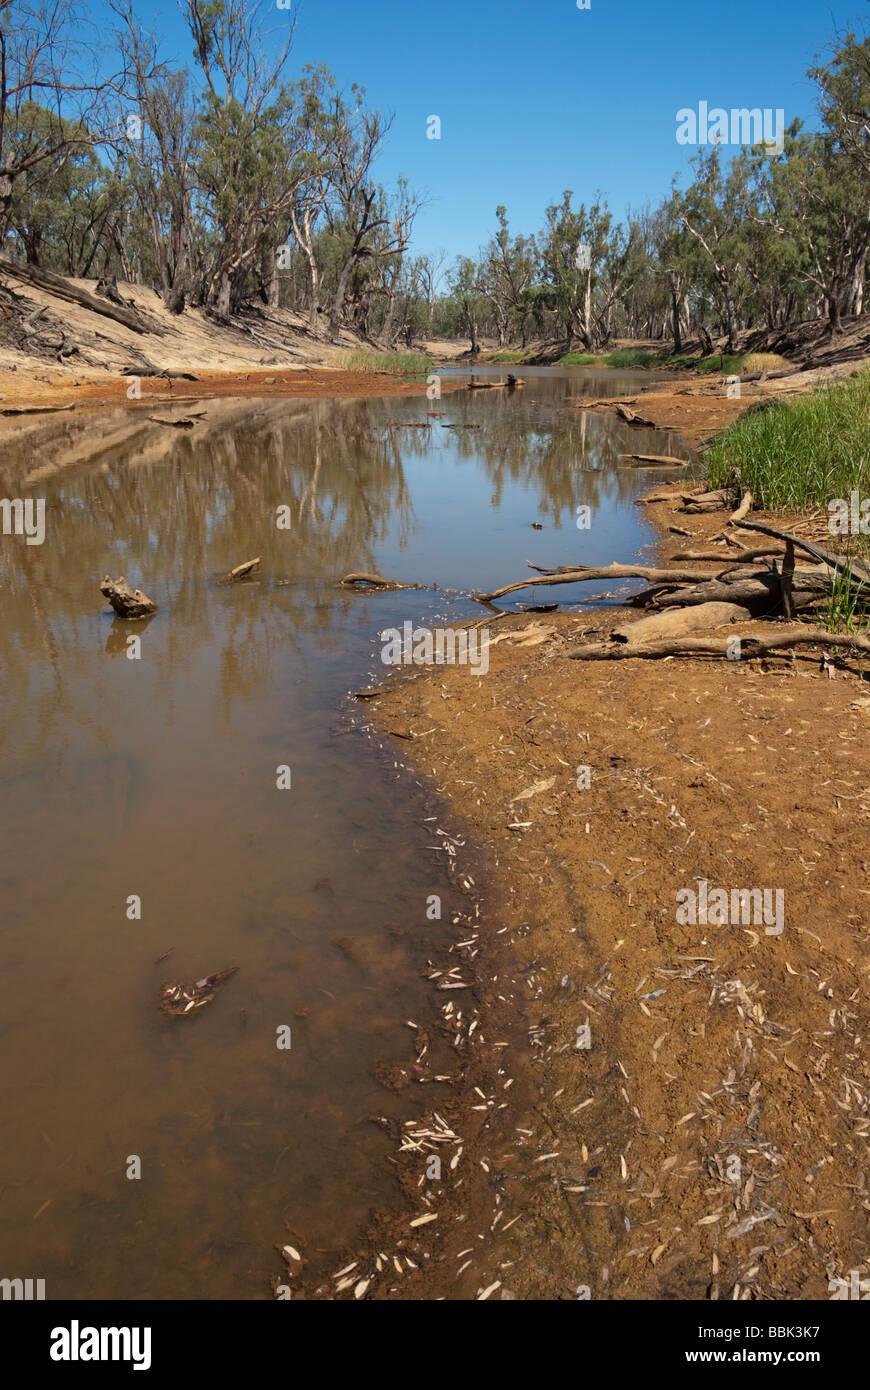 Environmental damage in Australia's Wakool River - Stock Image